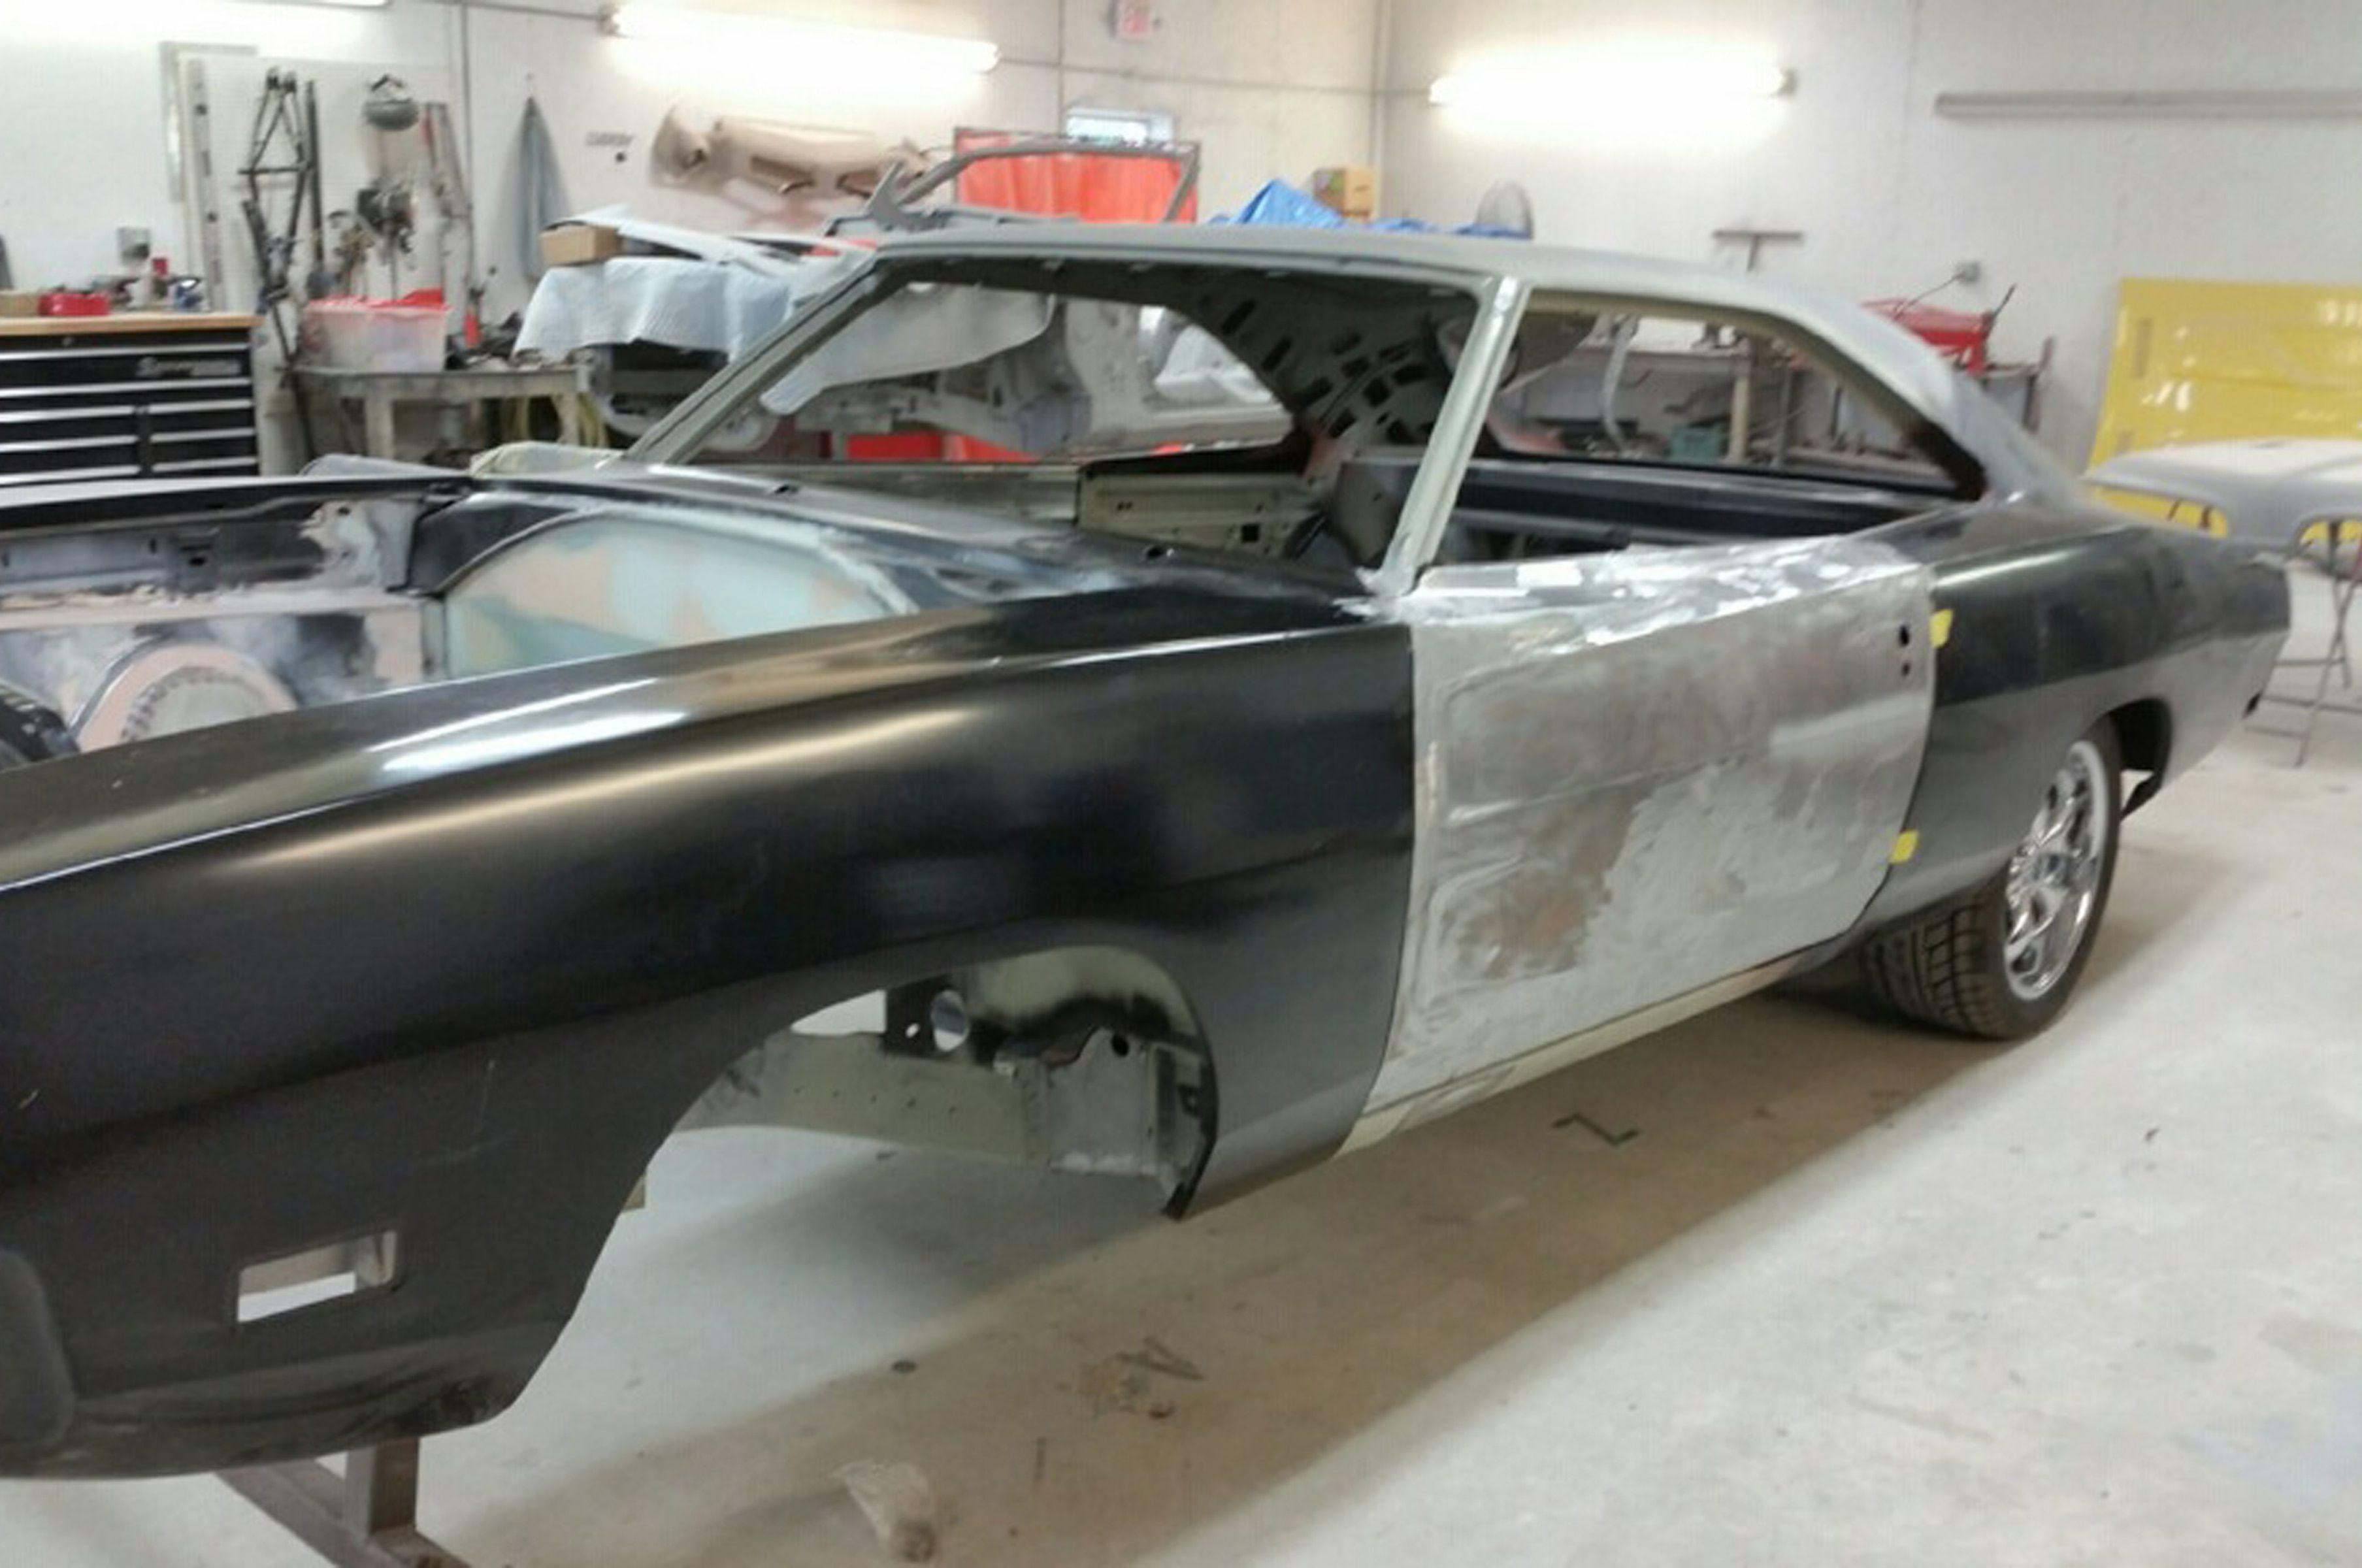 How To Aligning Mopar Body Panels Mopar Body 1969 Dodge Charger